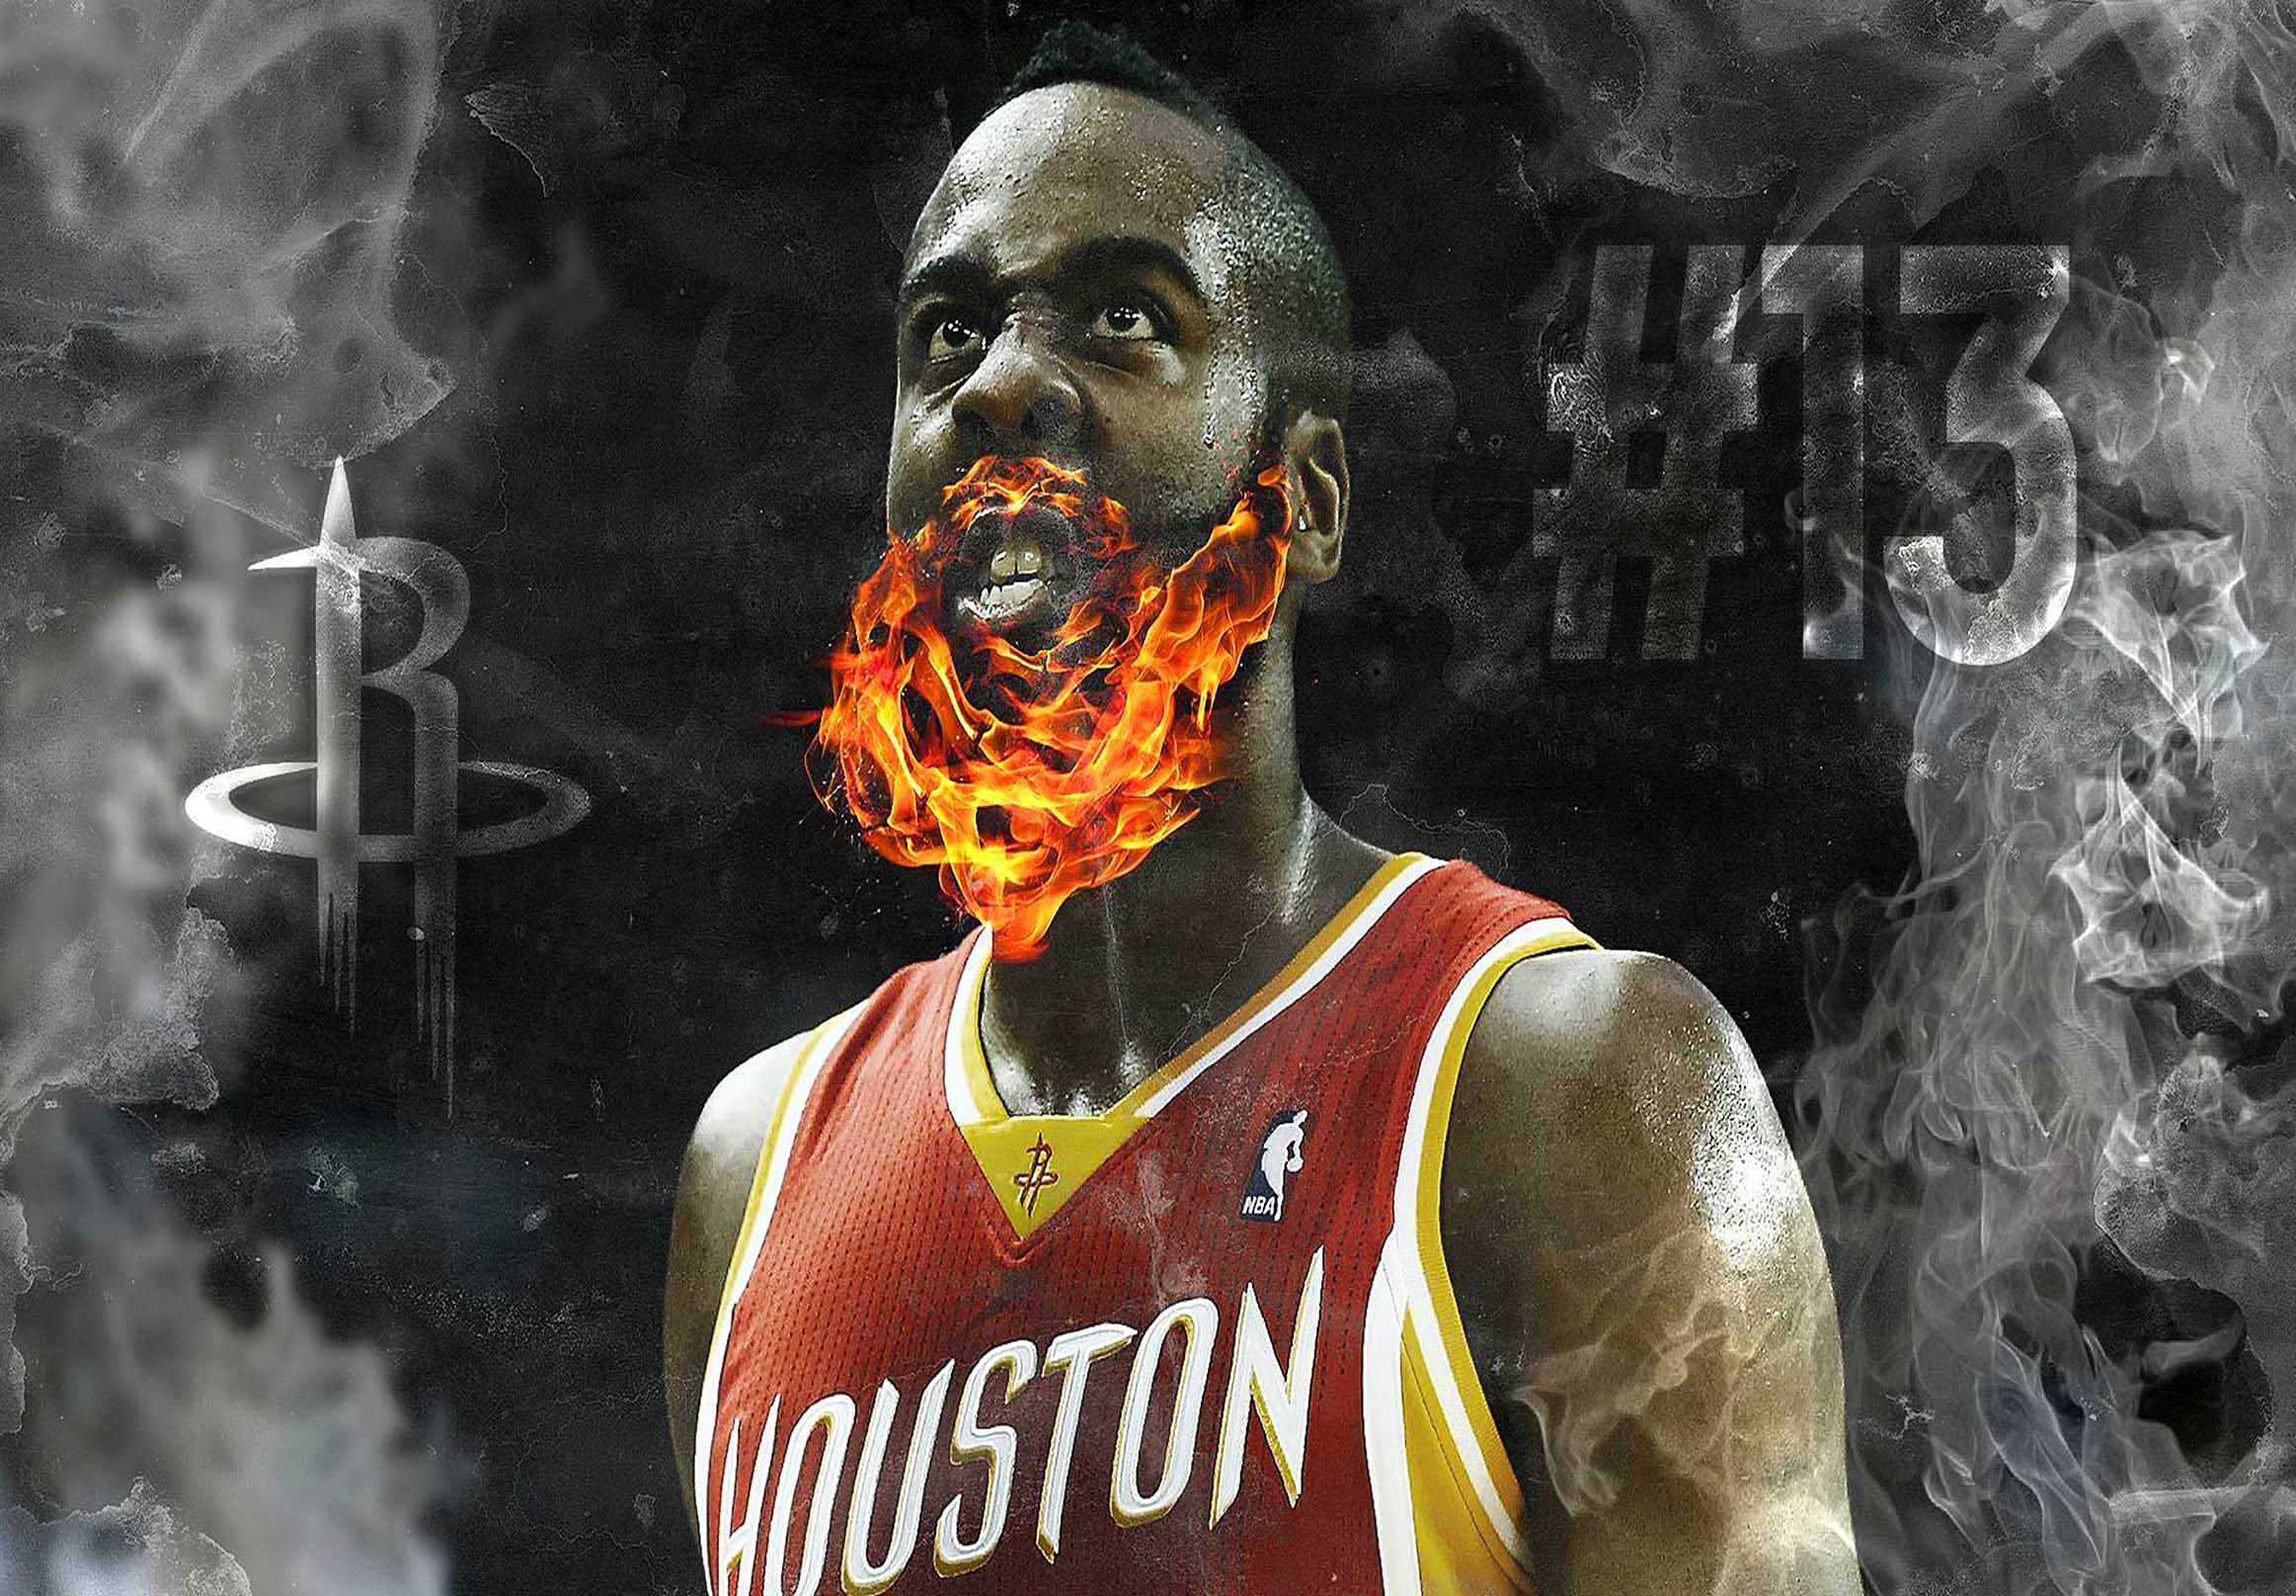 Houston Rockets James Harden Canvas Tablo (Nba-canvas-hardennew)